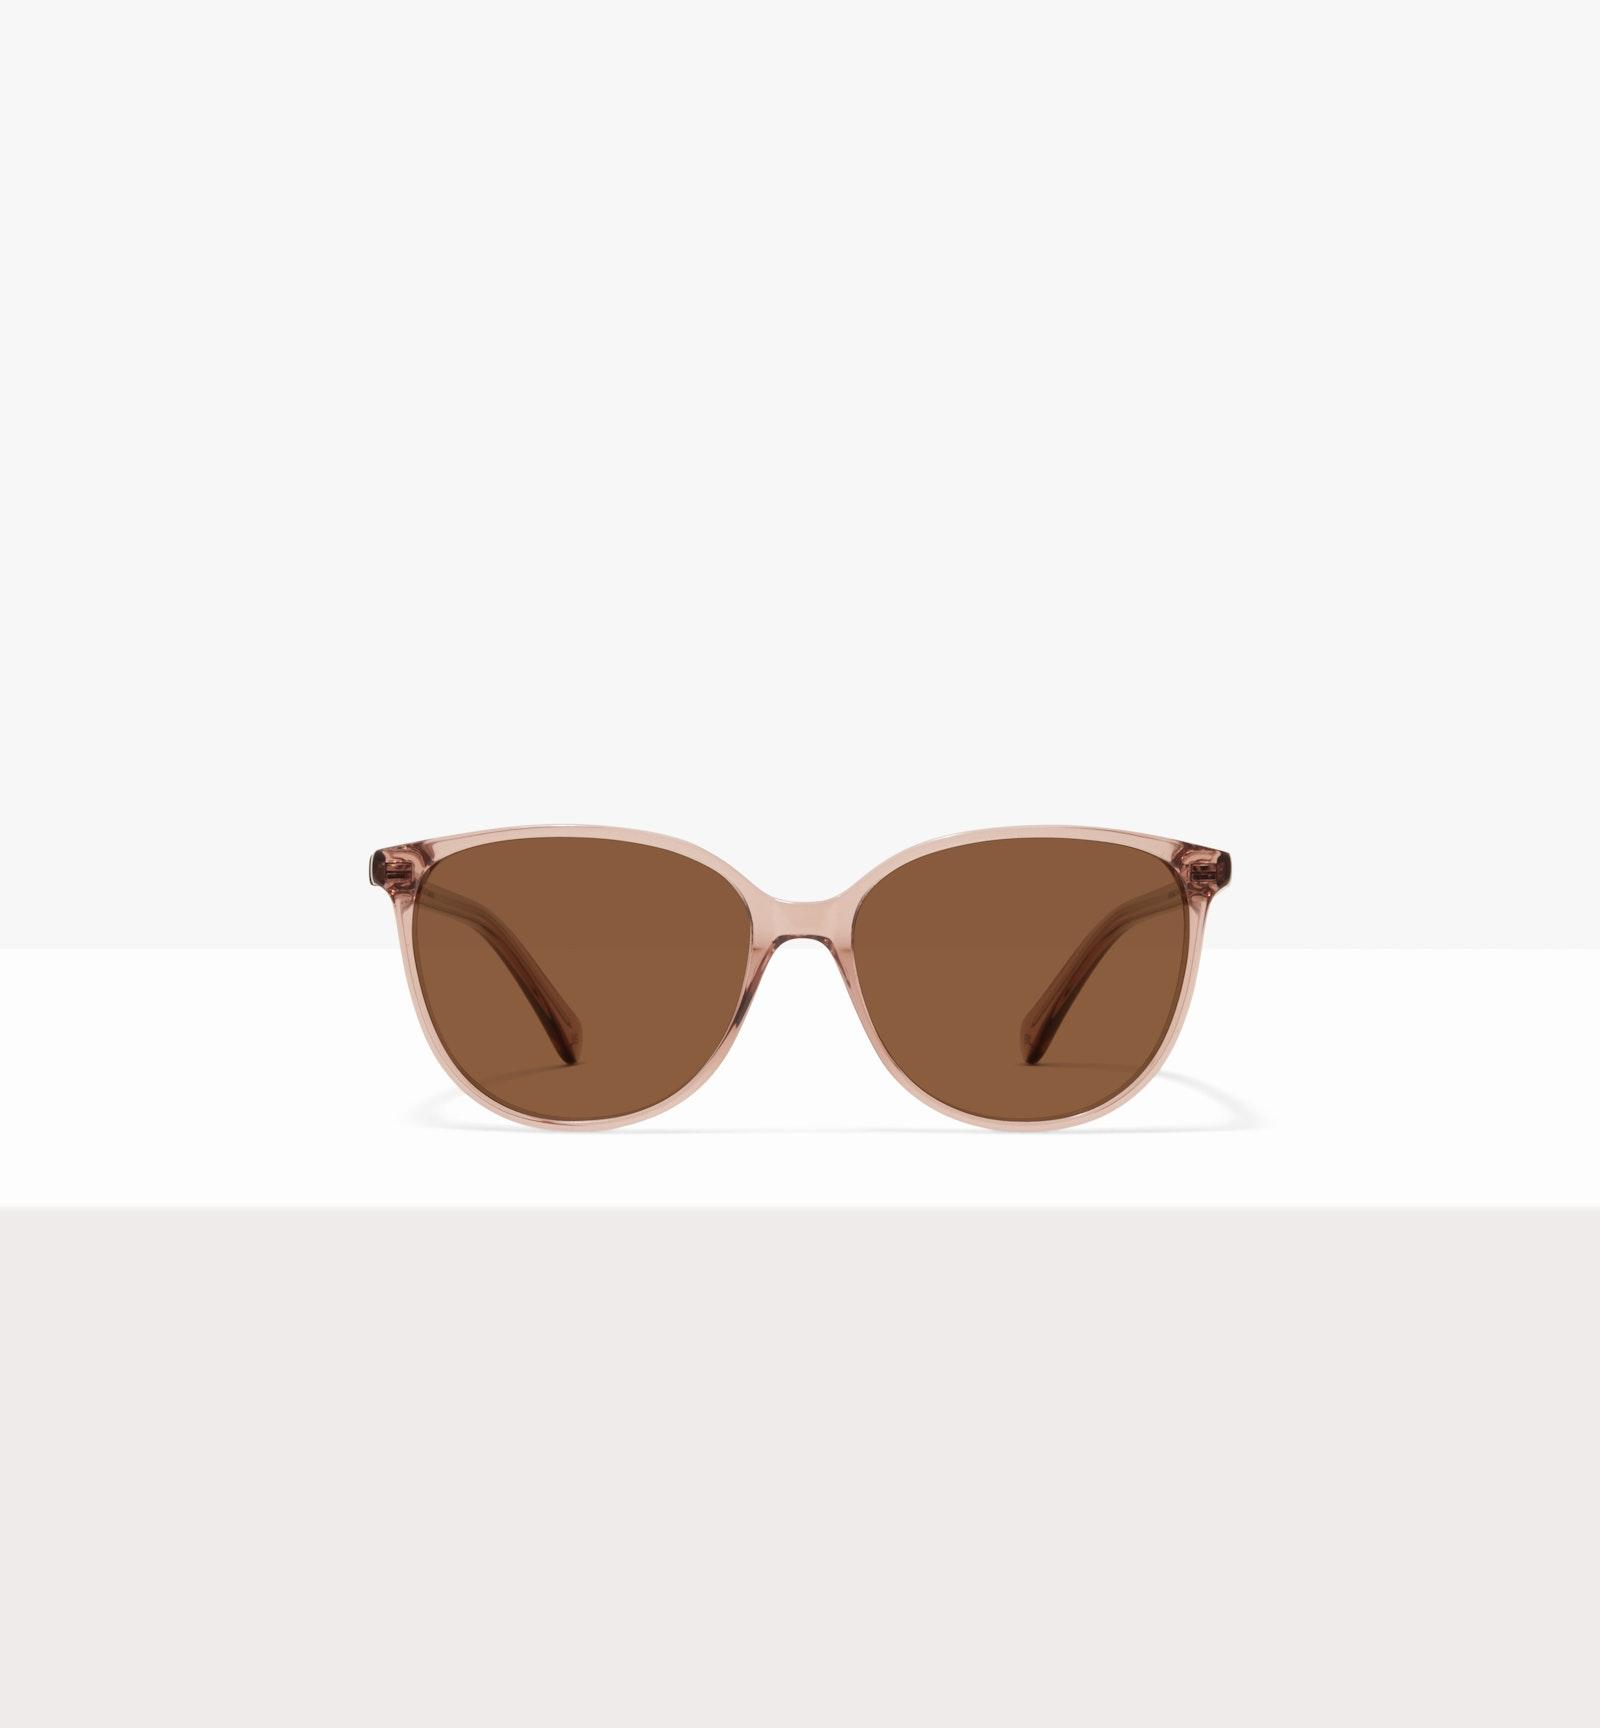 Affordable Fashion Glasses Cat Eye Sunglasses Women Imagine XL Rose